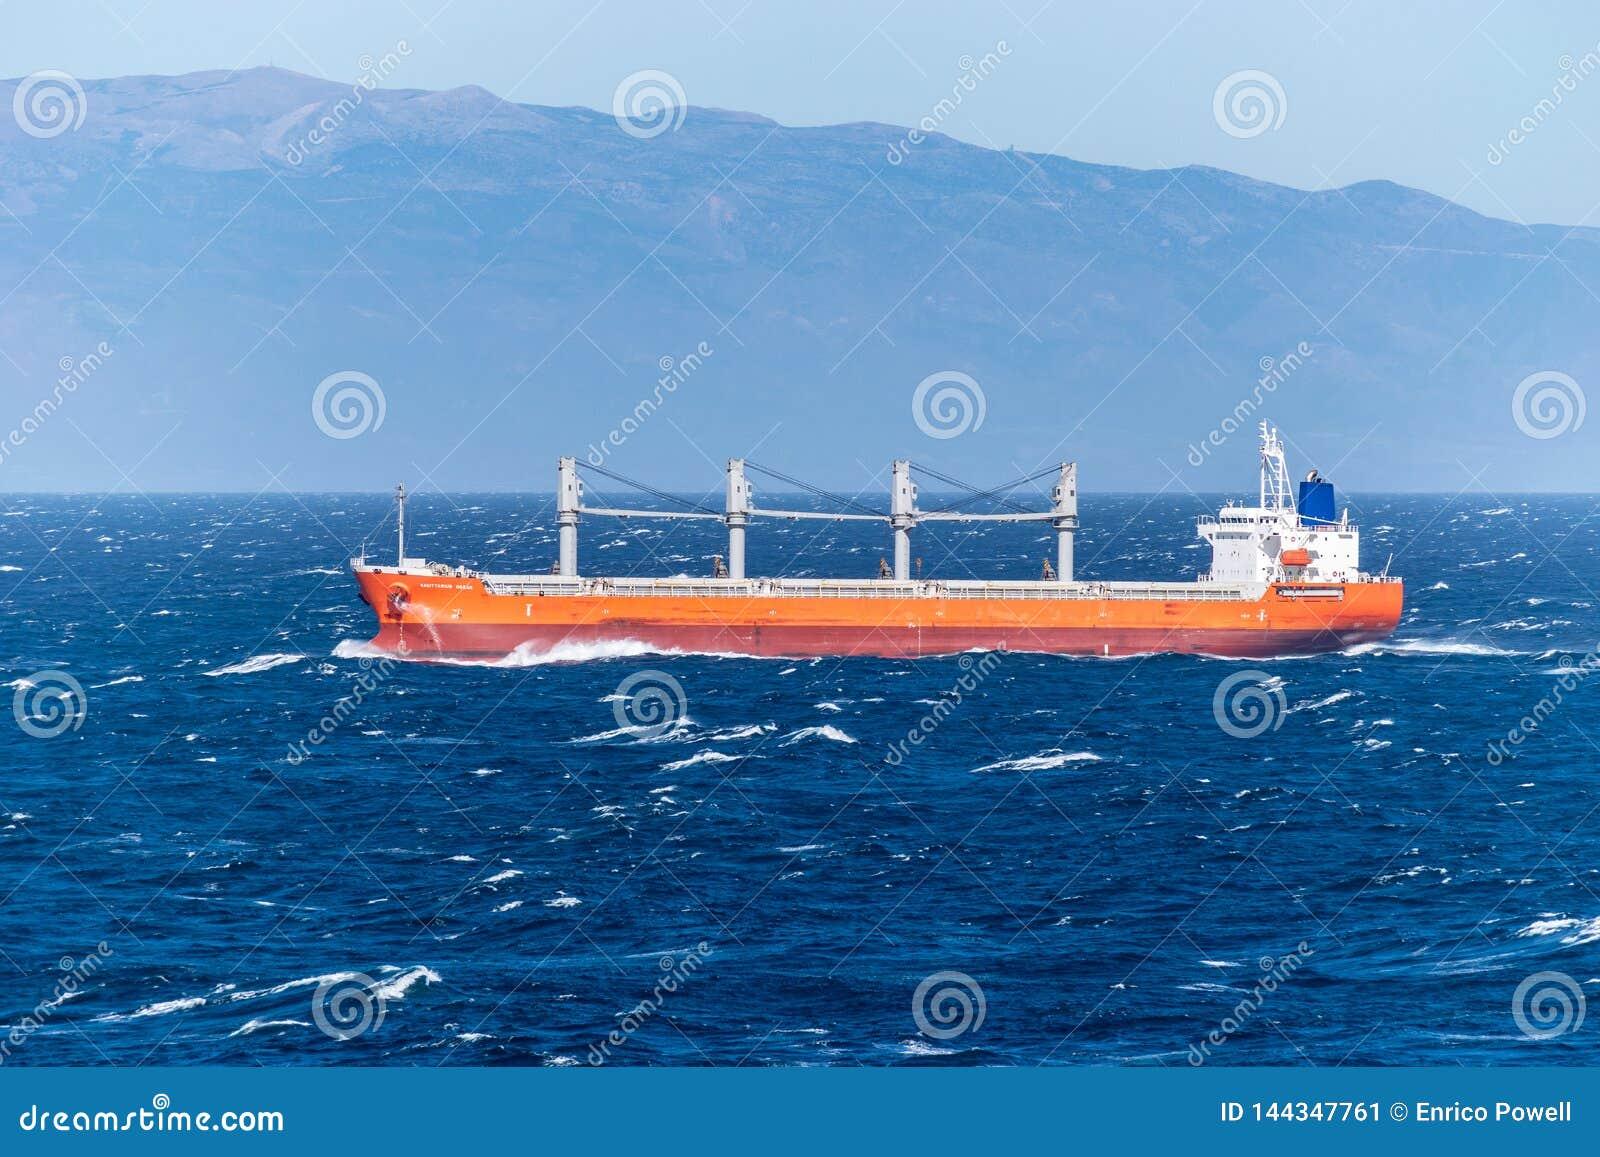 Sagittarius Ocean, a Cargo Bulk Carrier, sailing across the Atlantic Ocean